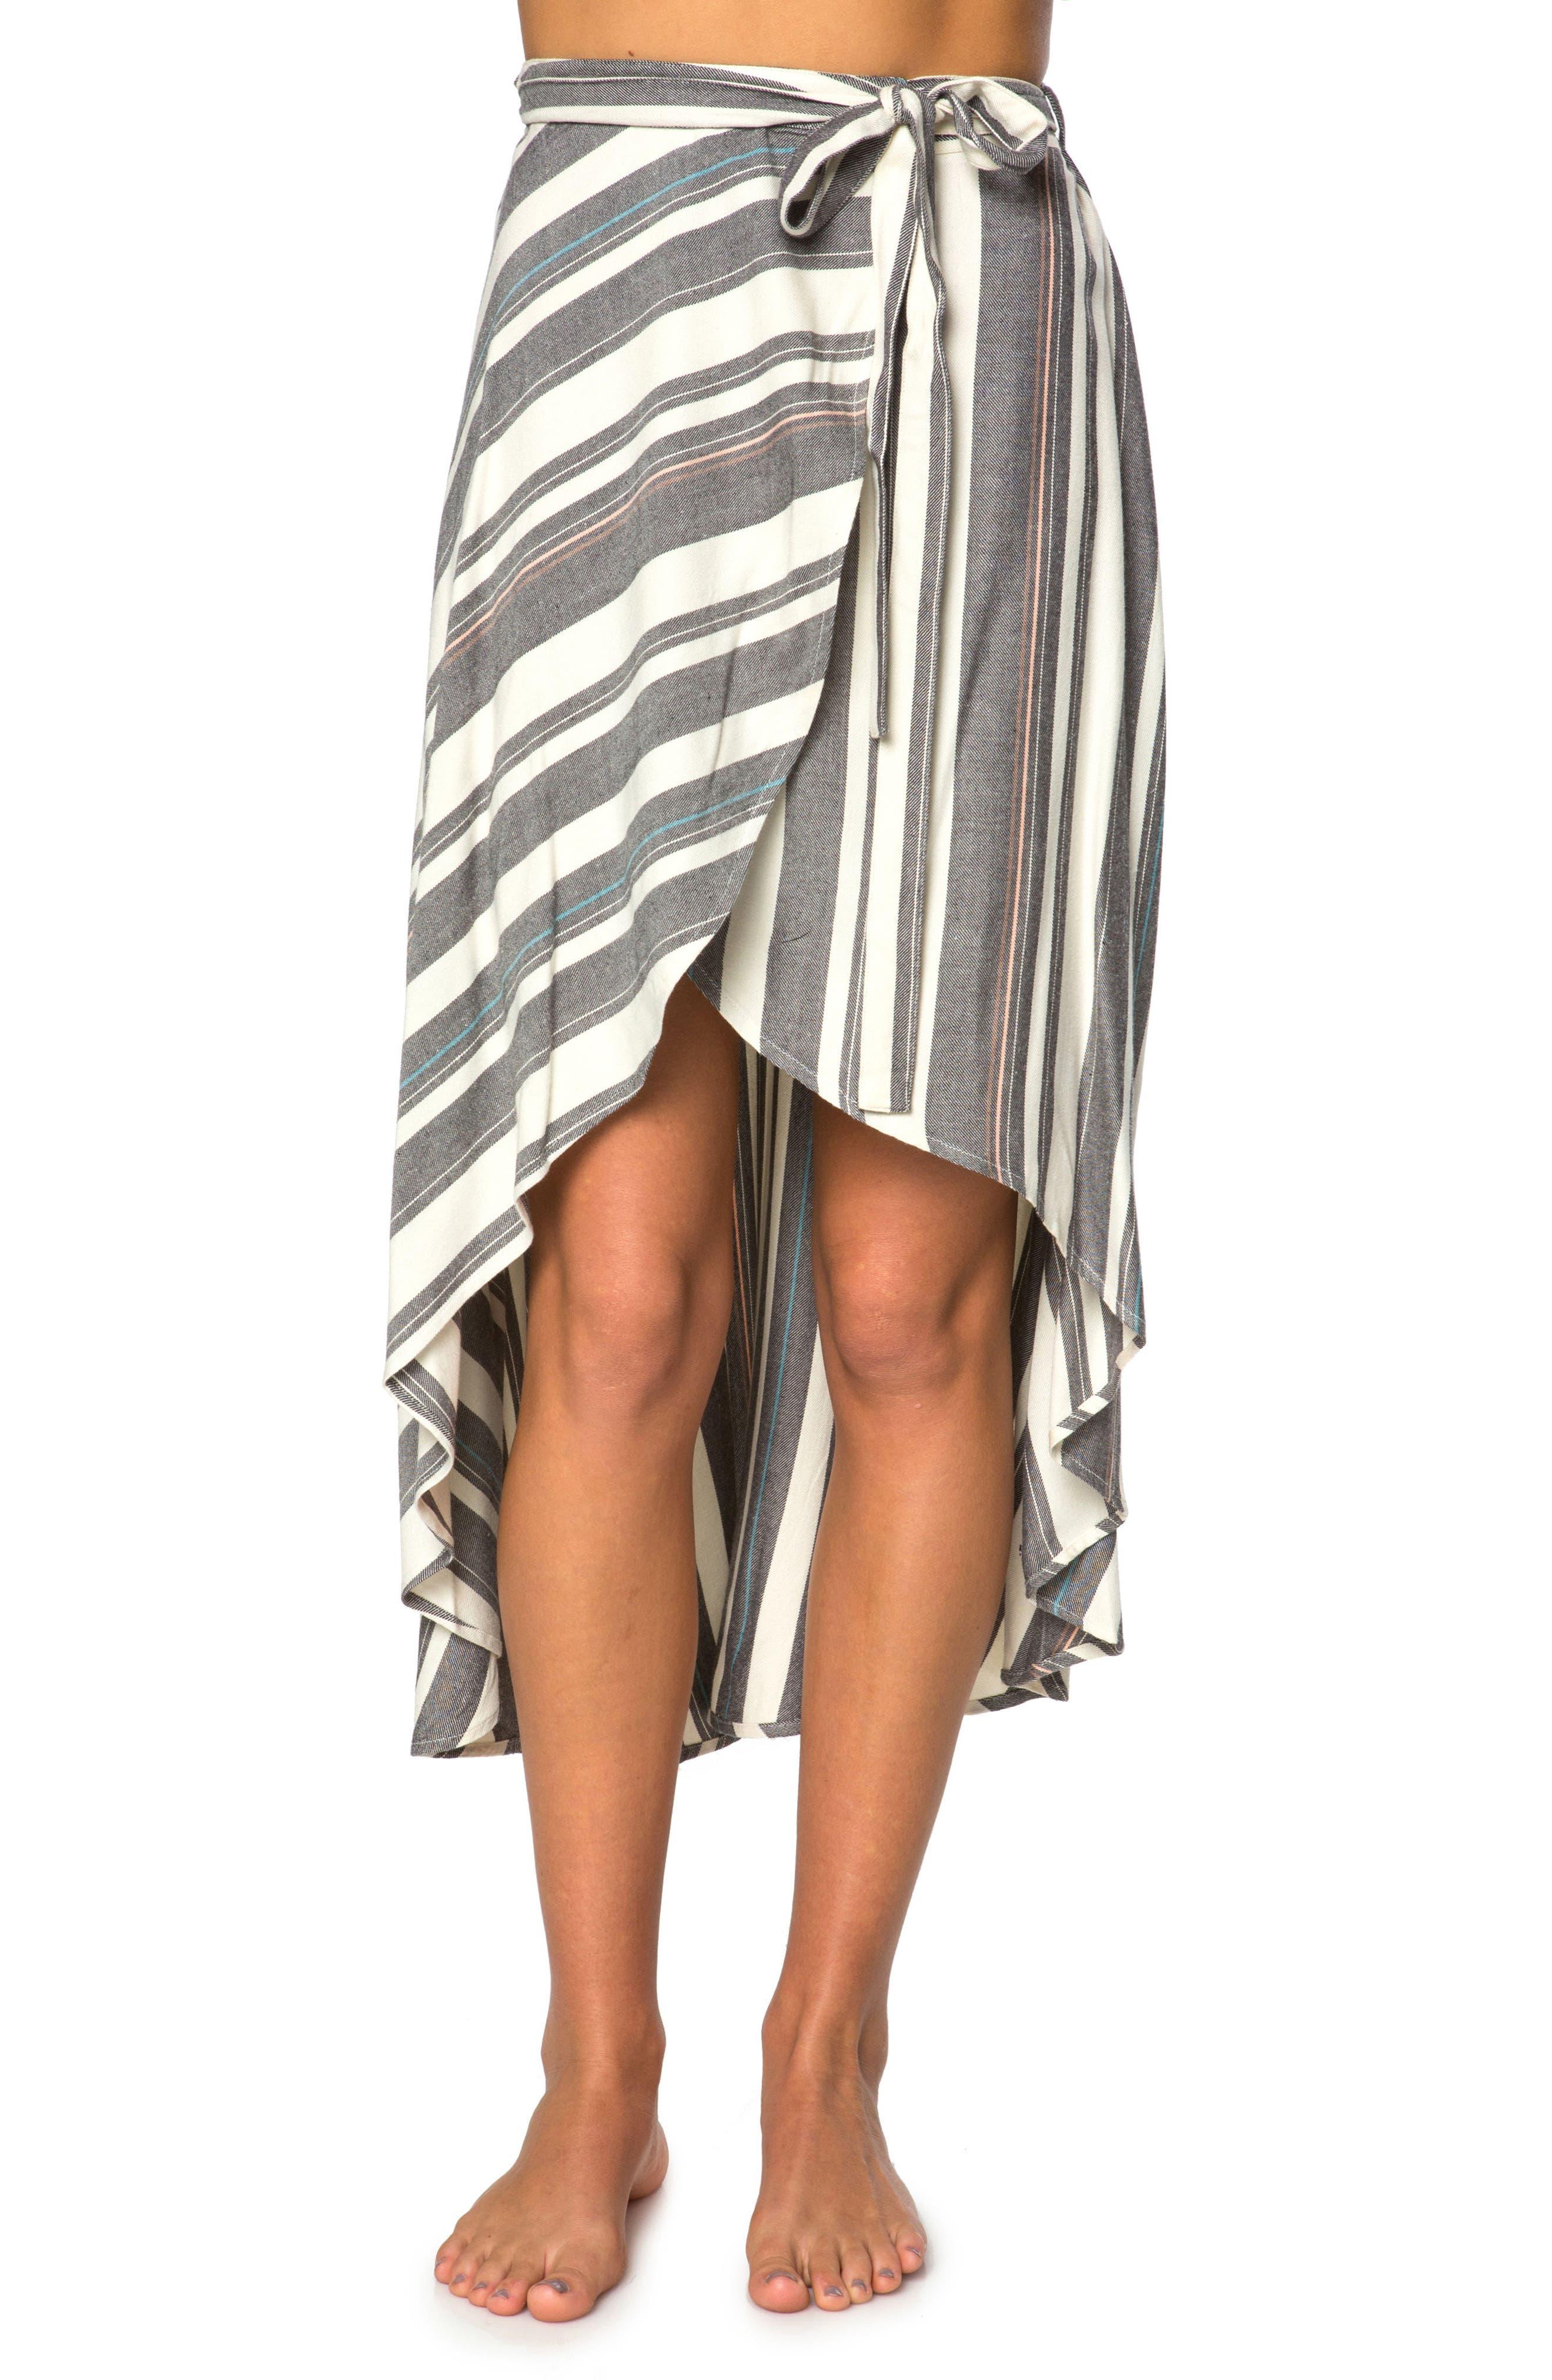 Main Image - O'Neill x Natalie Off Duty Savi Woven Skirt